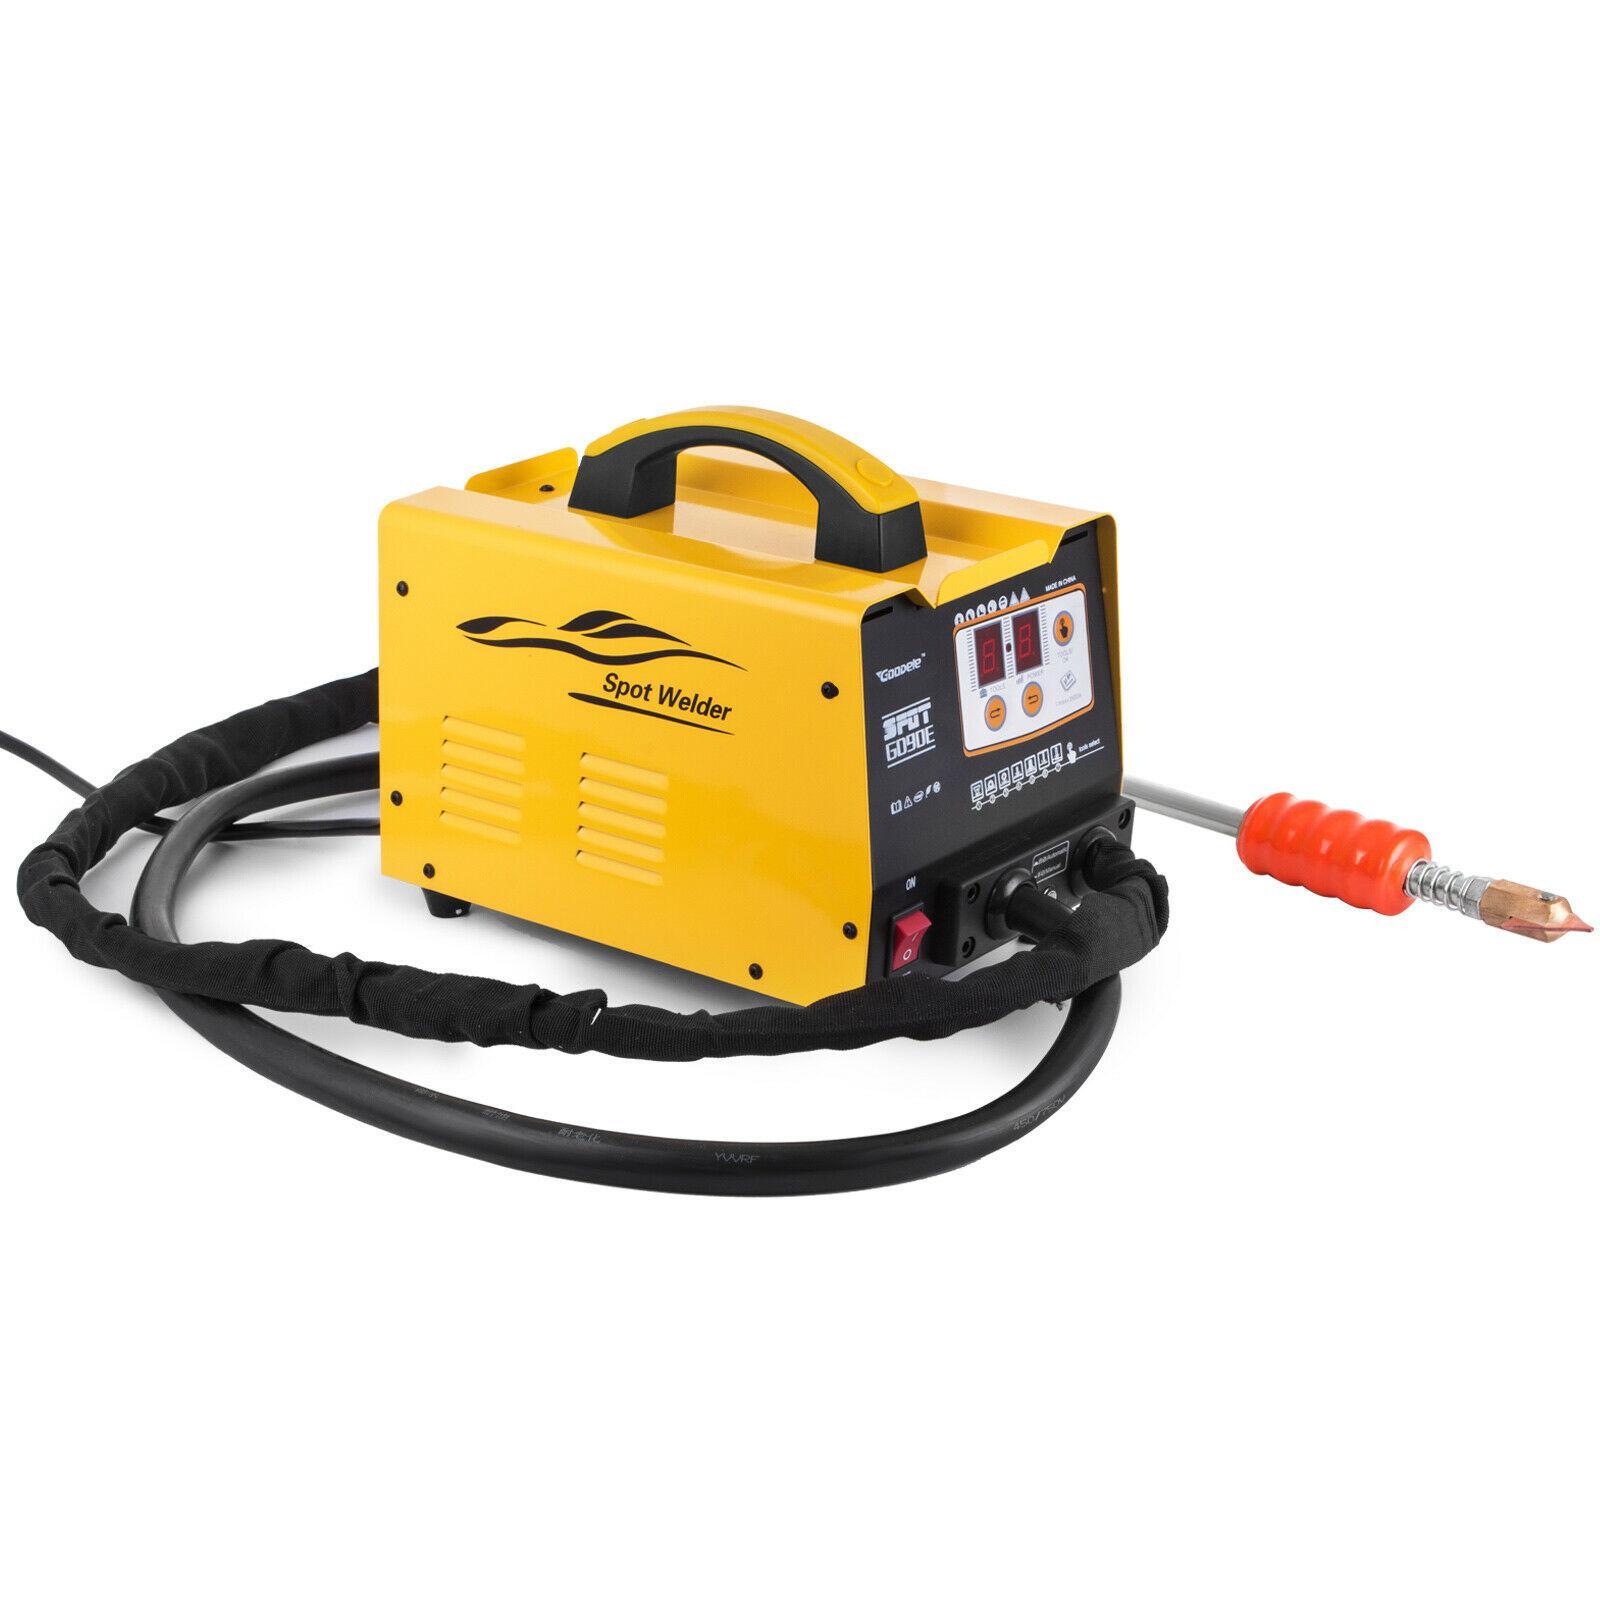 2020 New G90e 110v 220v Spot Welder Dent Reminder Car Tool Dent Repair Spotter 3500a Spot Welding Machine From Bestofferforyou 269 21 Dhgate Com